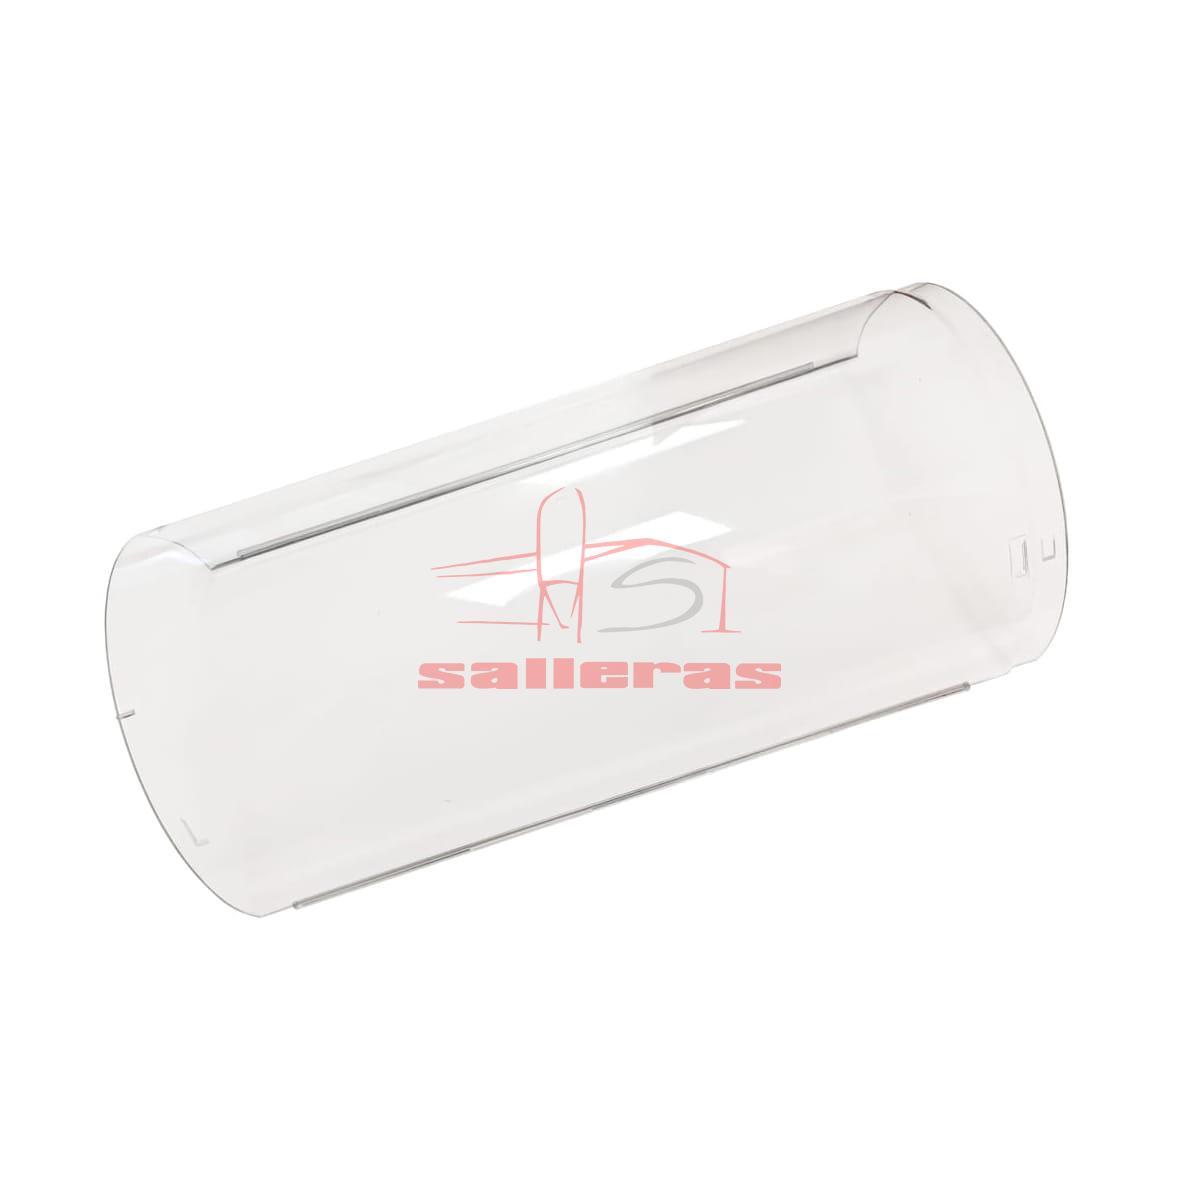 tubo dosificador clutch de plastico lateral